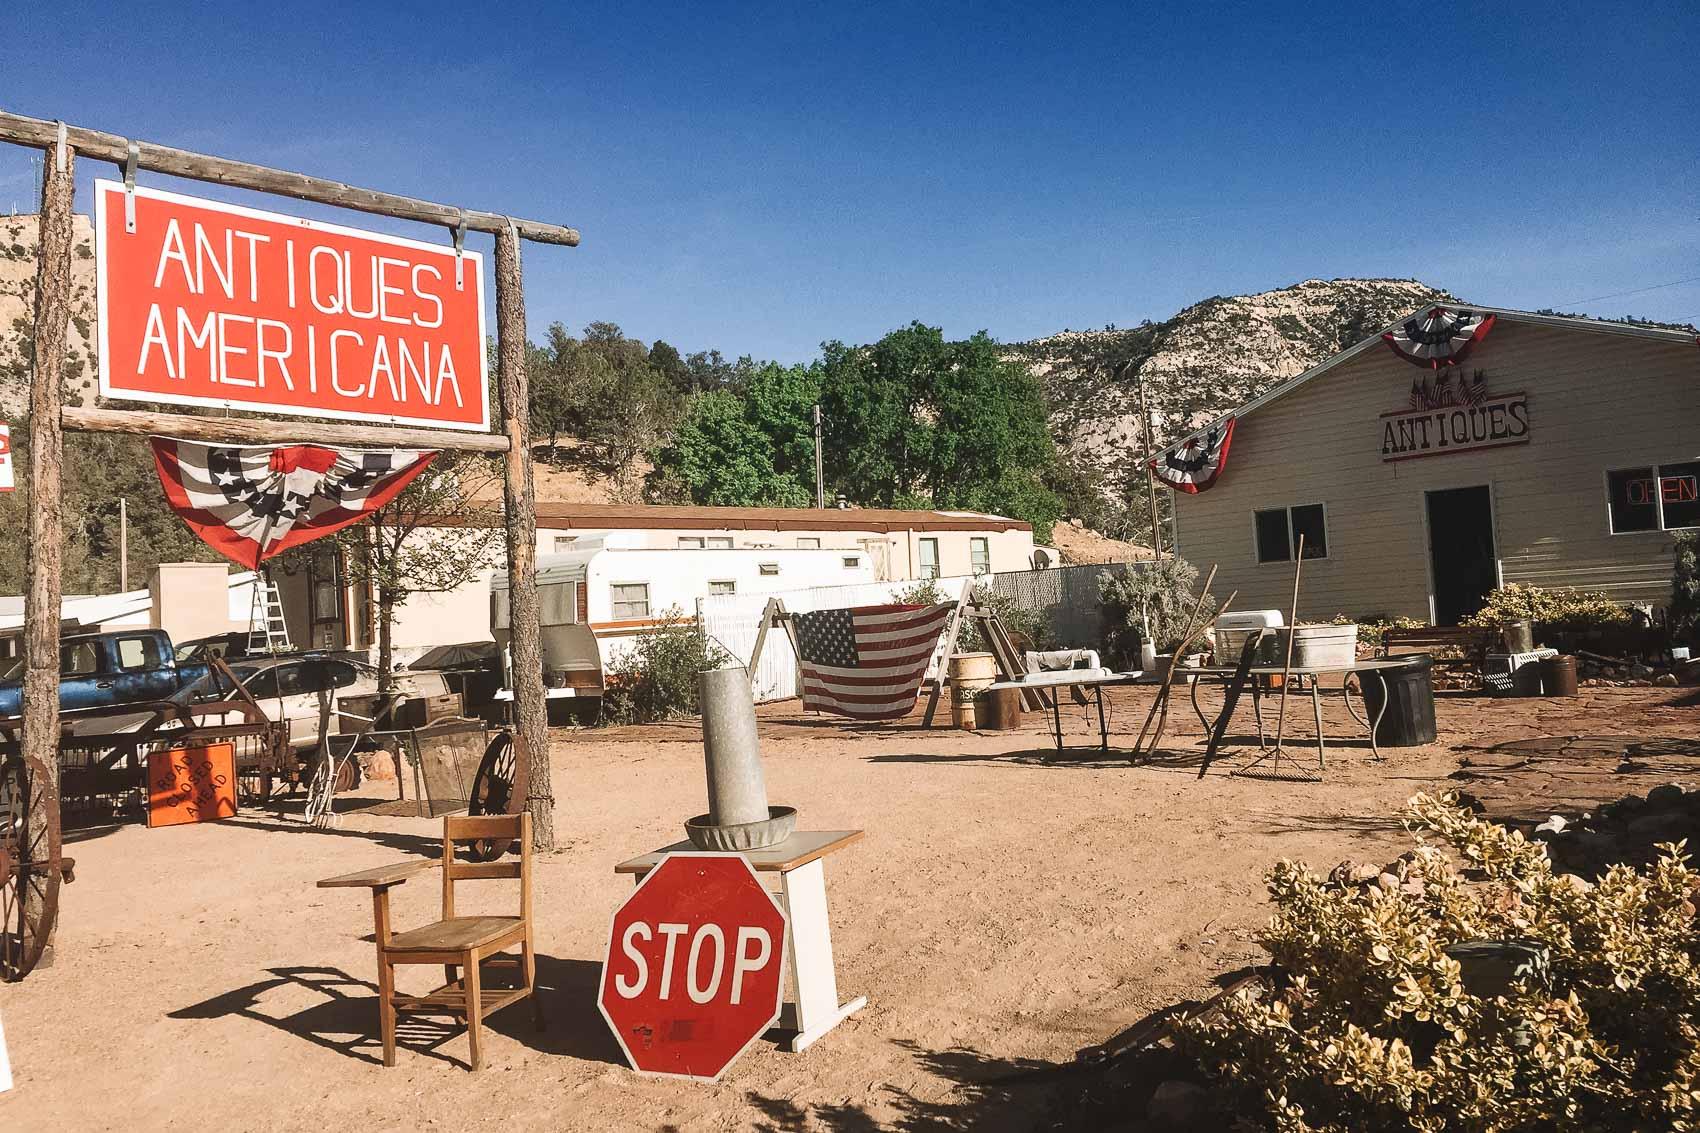 antiques americana shop in kanab, utah near best friends animal sanctuary - bucket list travel